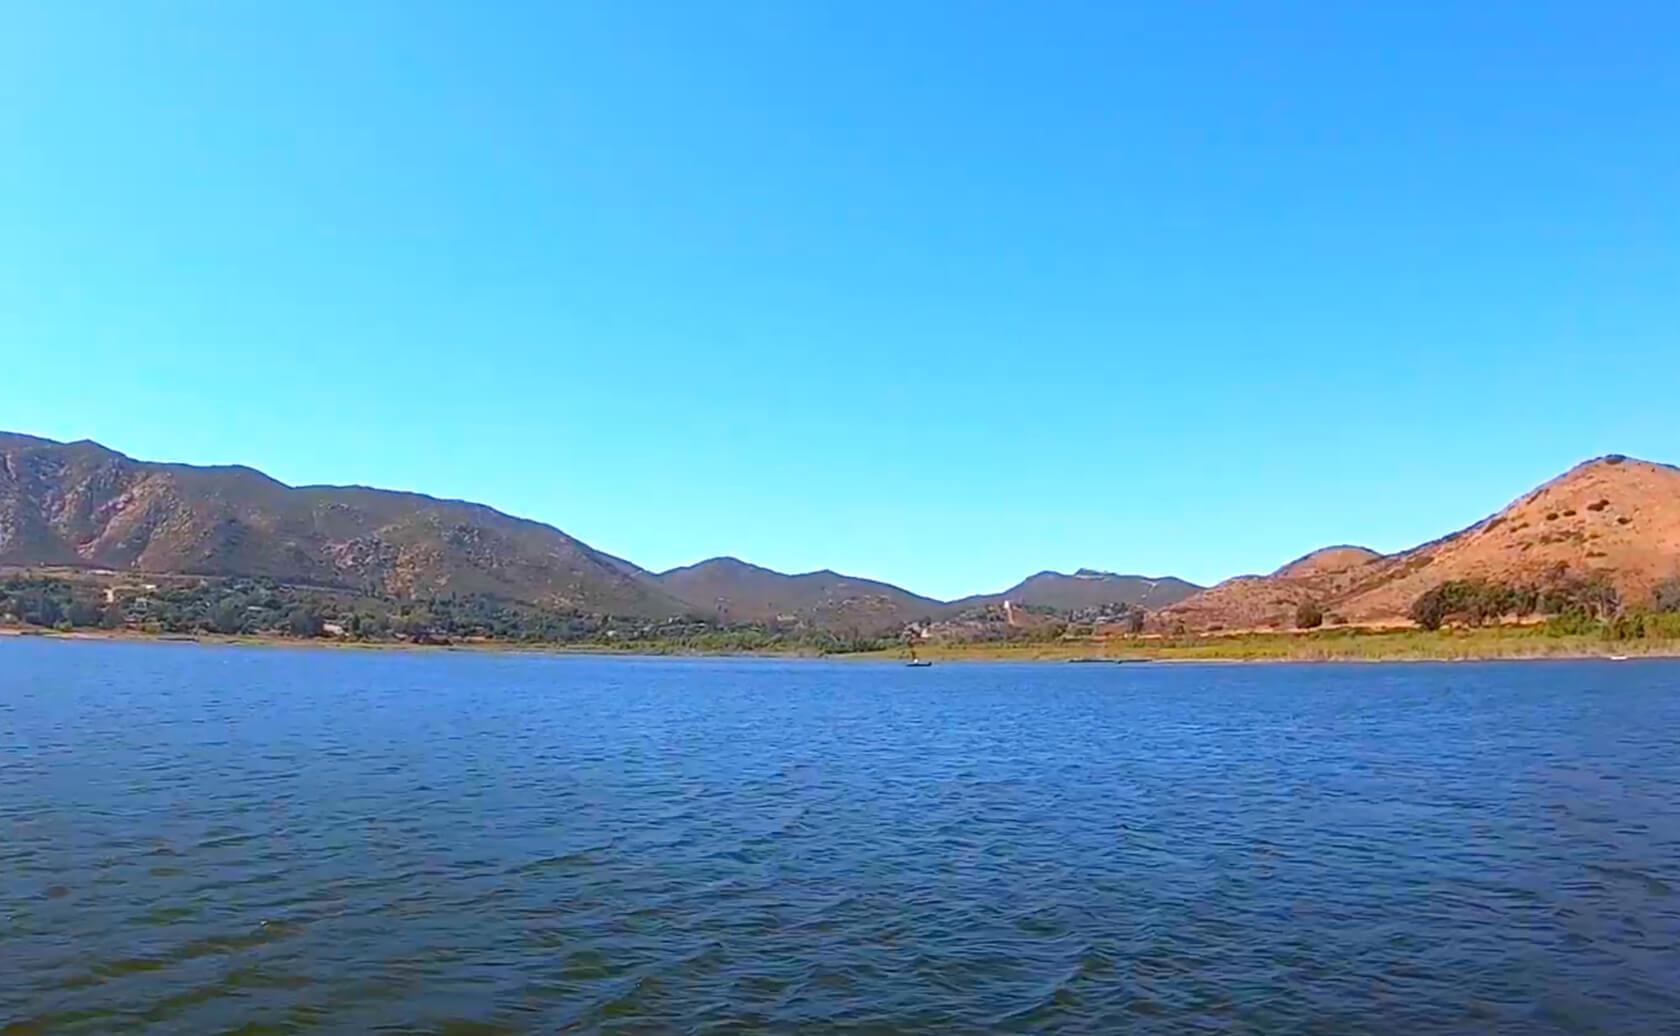 Lake-Hodges-Fishing-Guide-Report-San-Deigo-CA-01